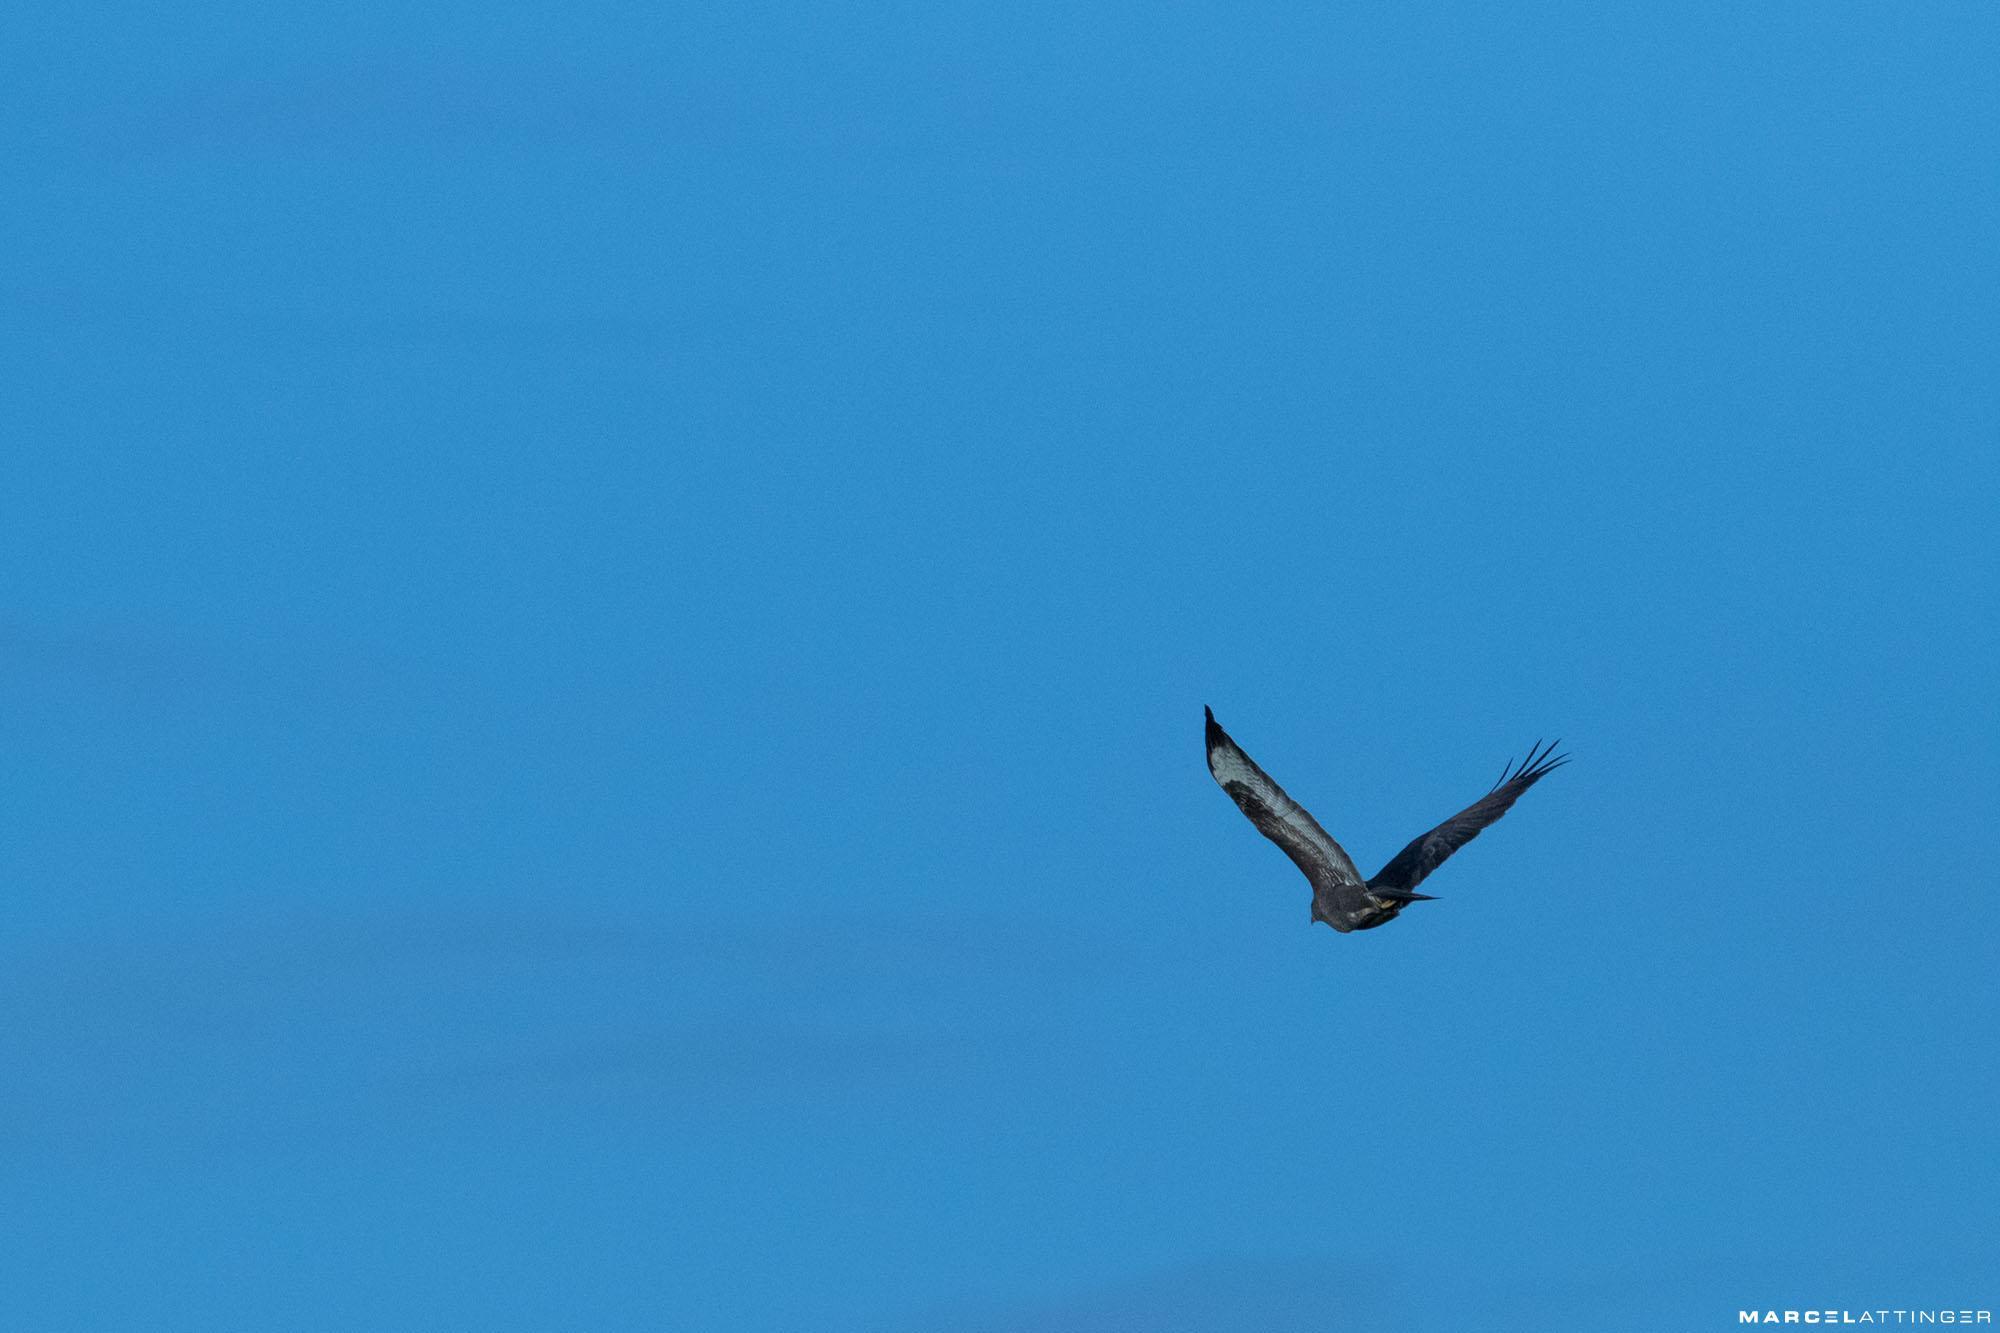 Roofvogel tegen strakblauwe lucht